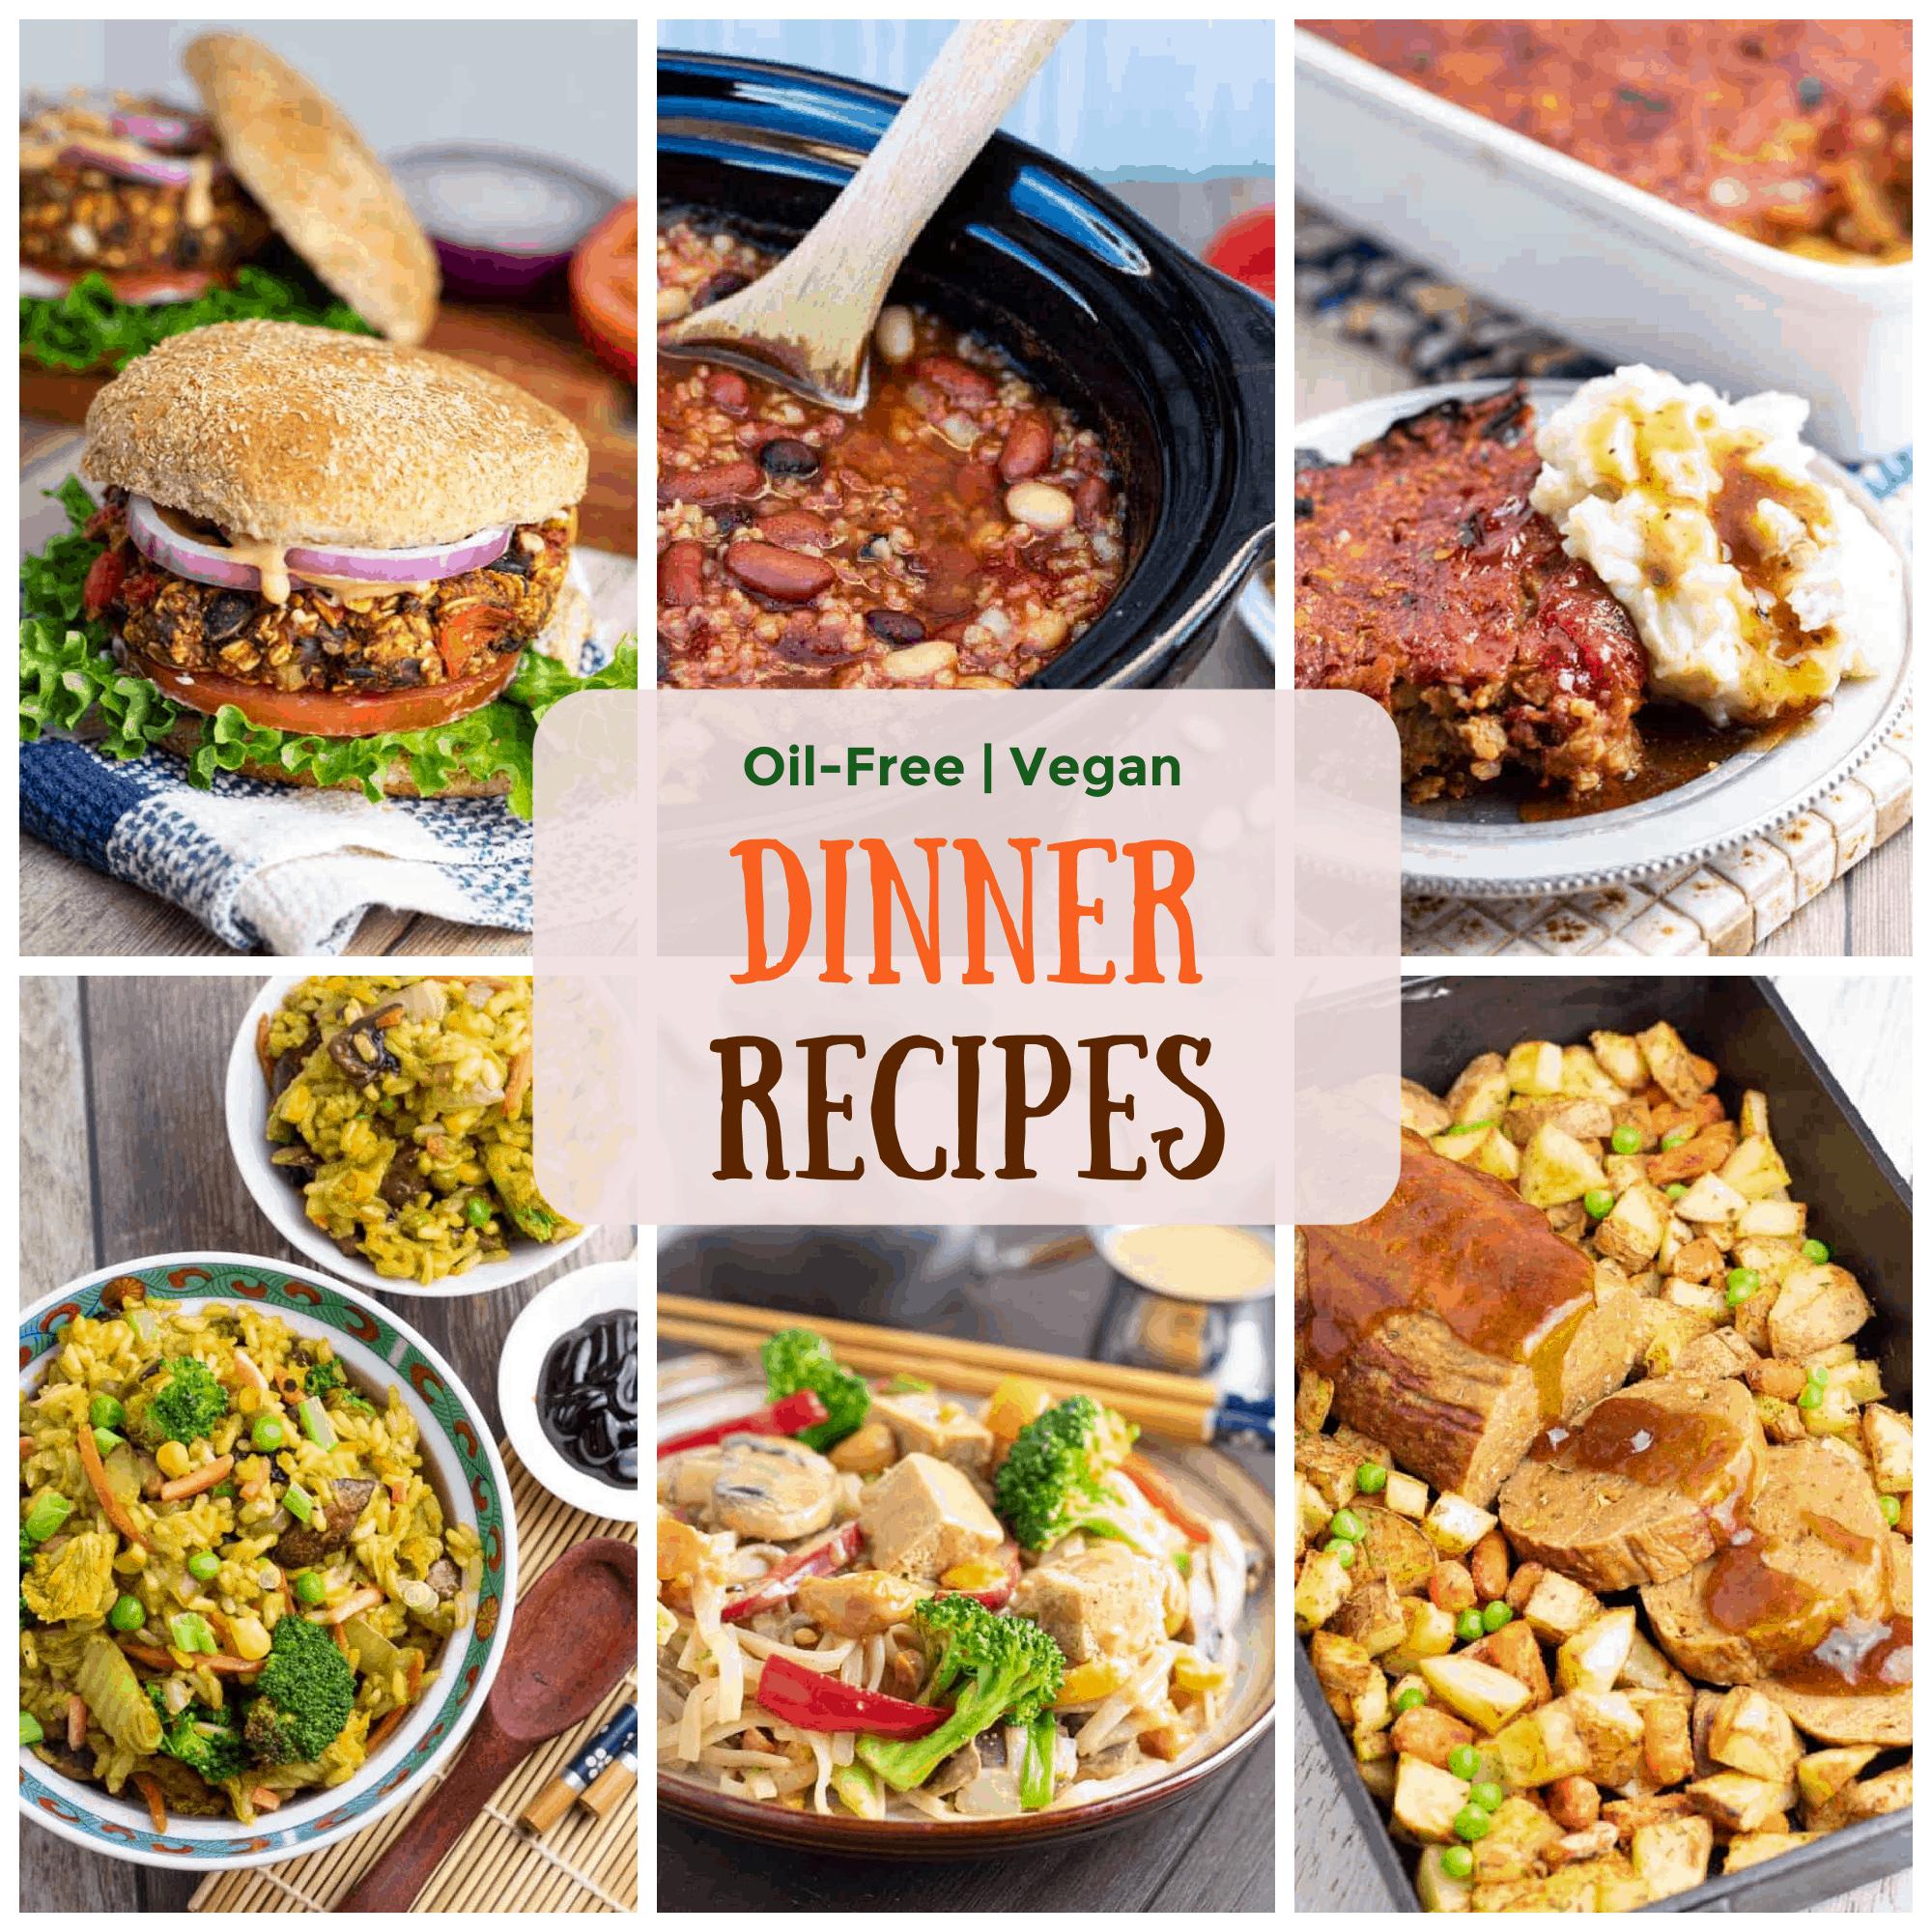 vegan dinner recipes photo collage